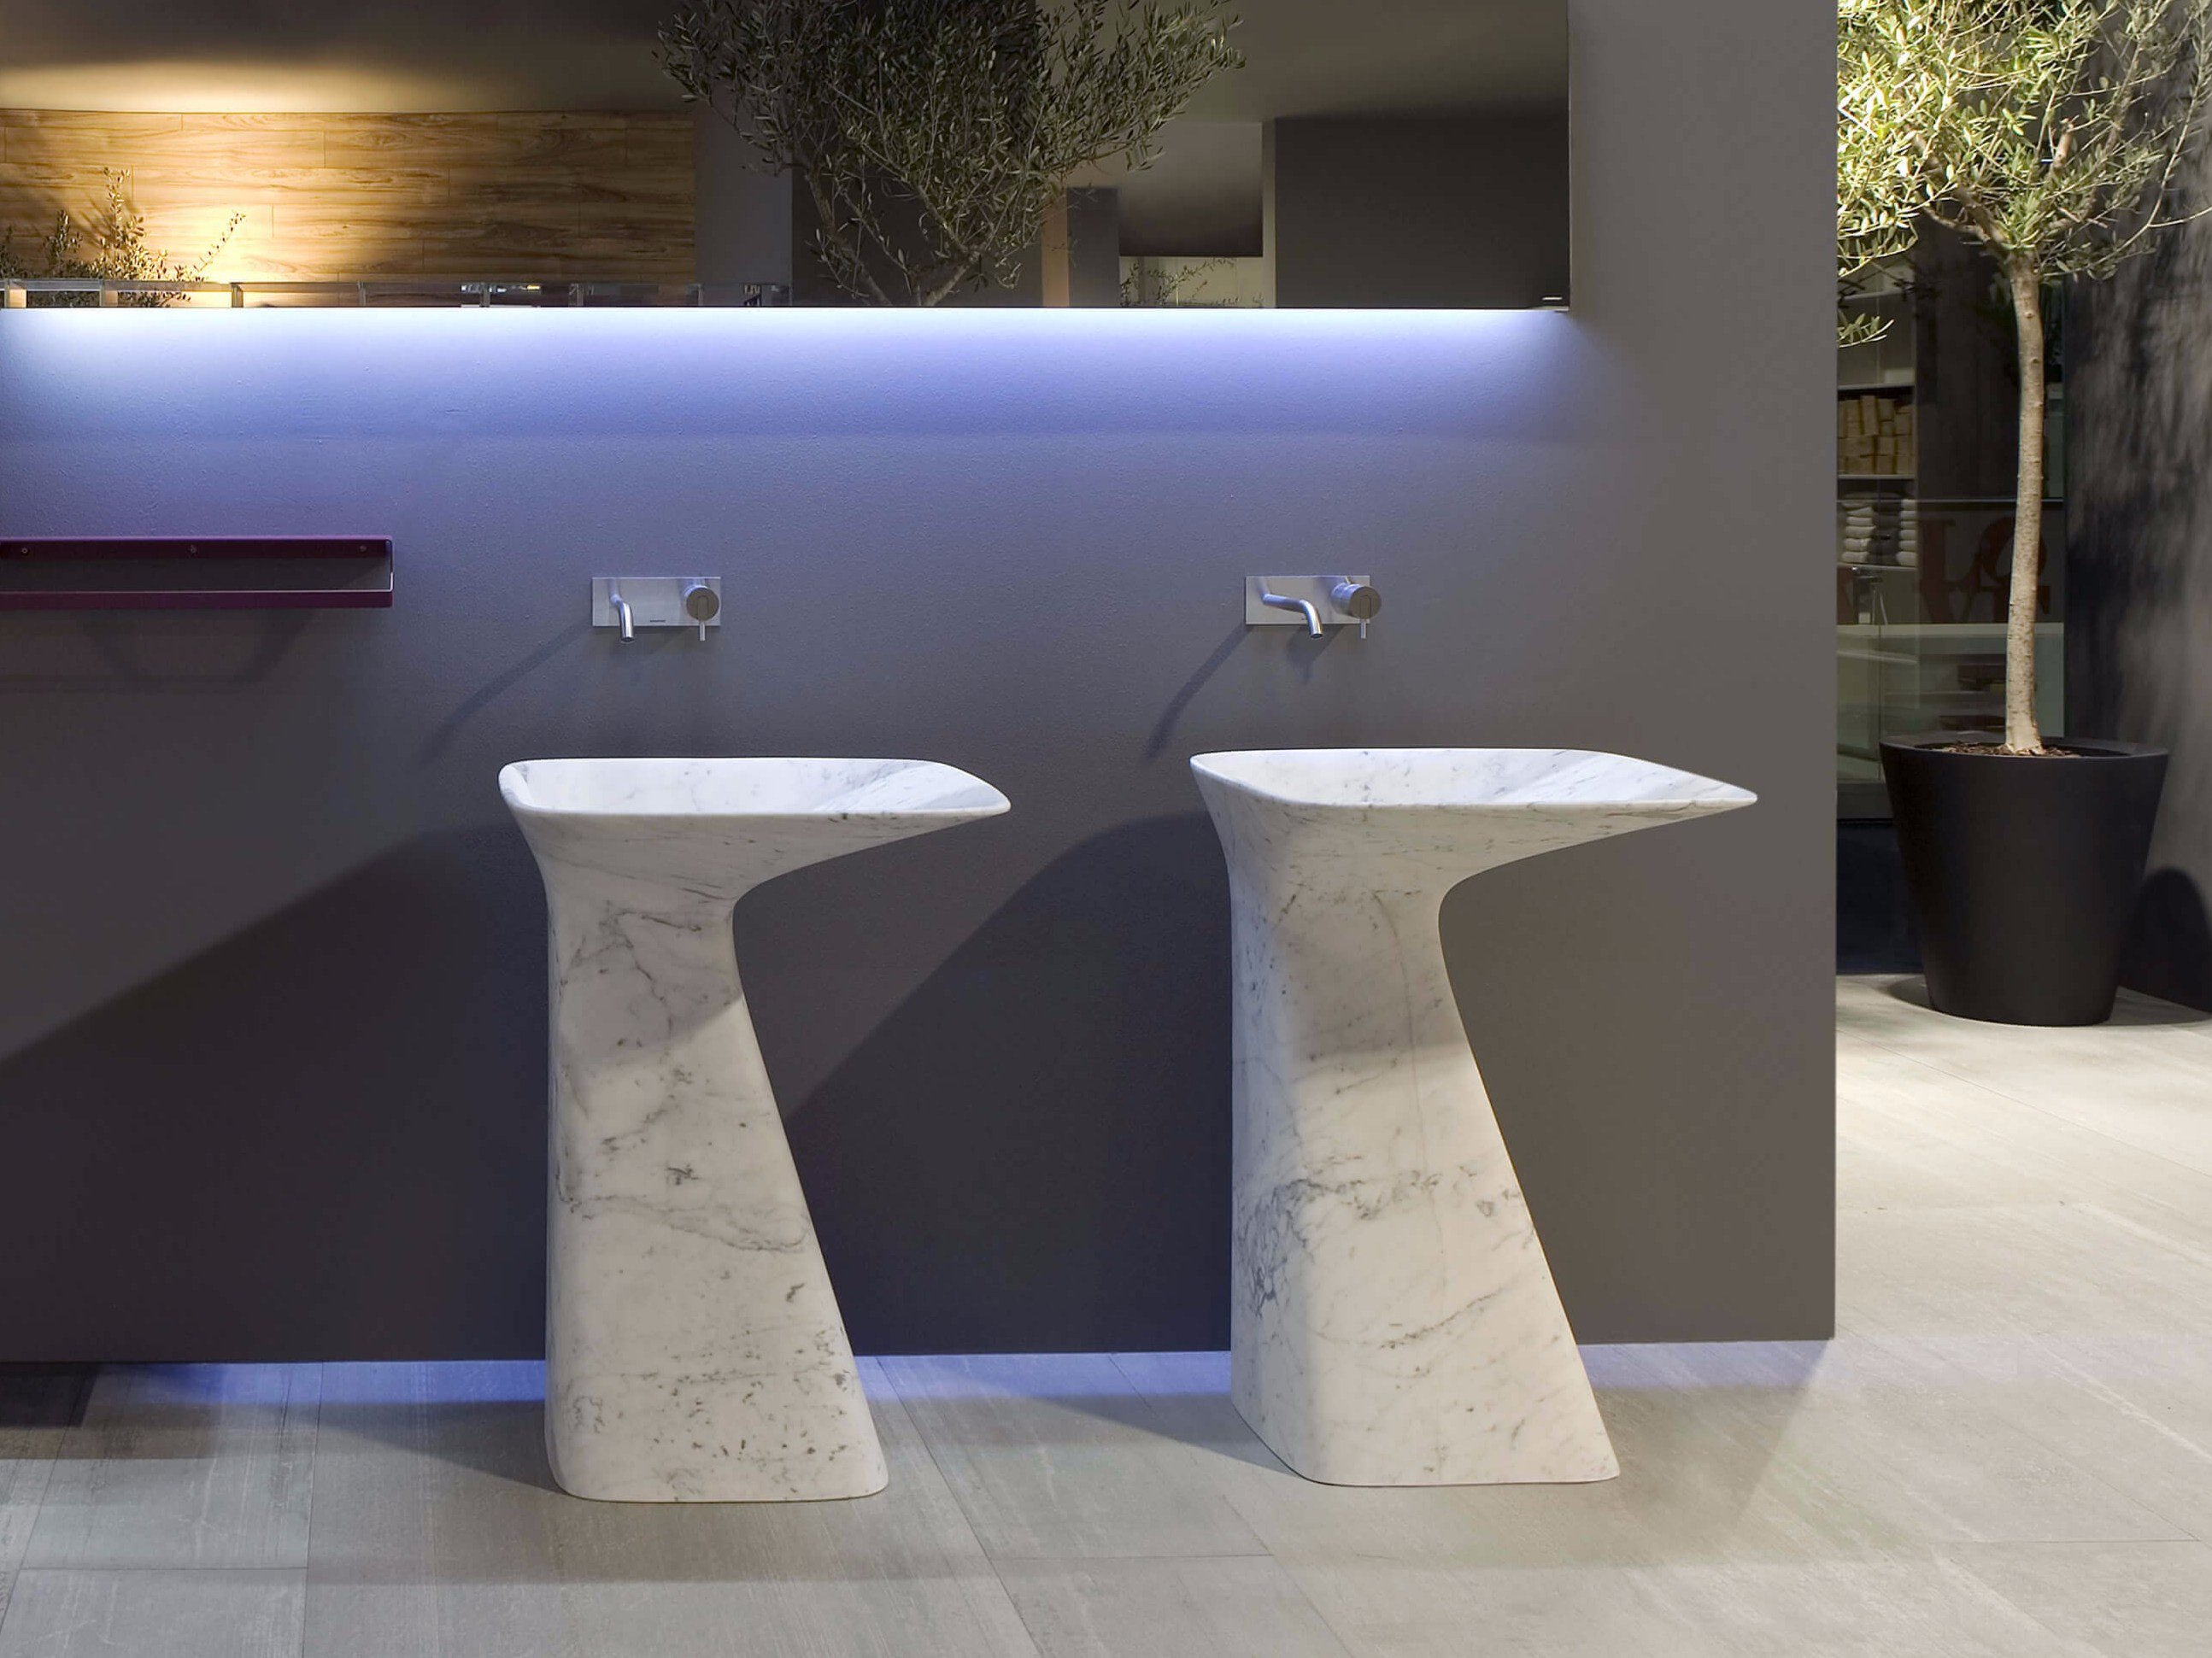 Stunning Antonio Lupi Prezzi Gallery - acrylicgiftware.us ...